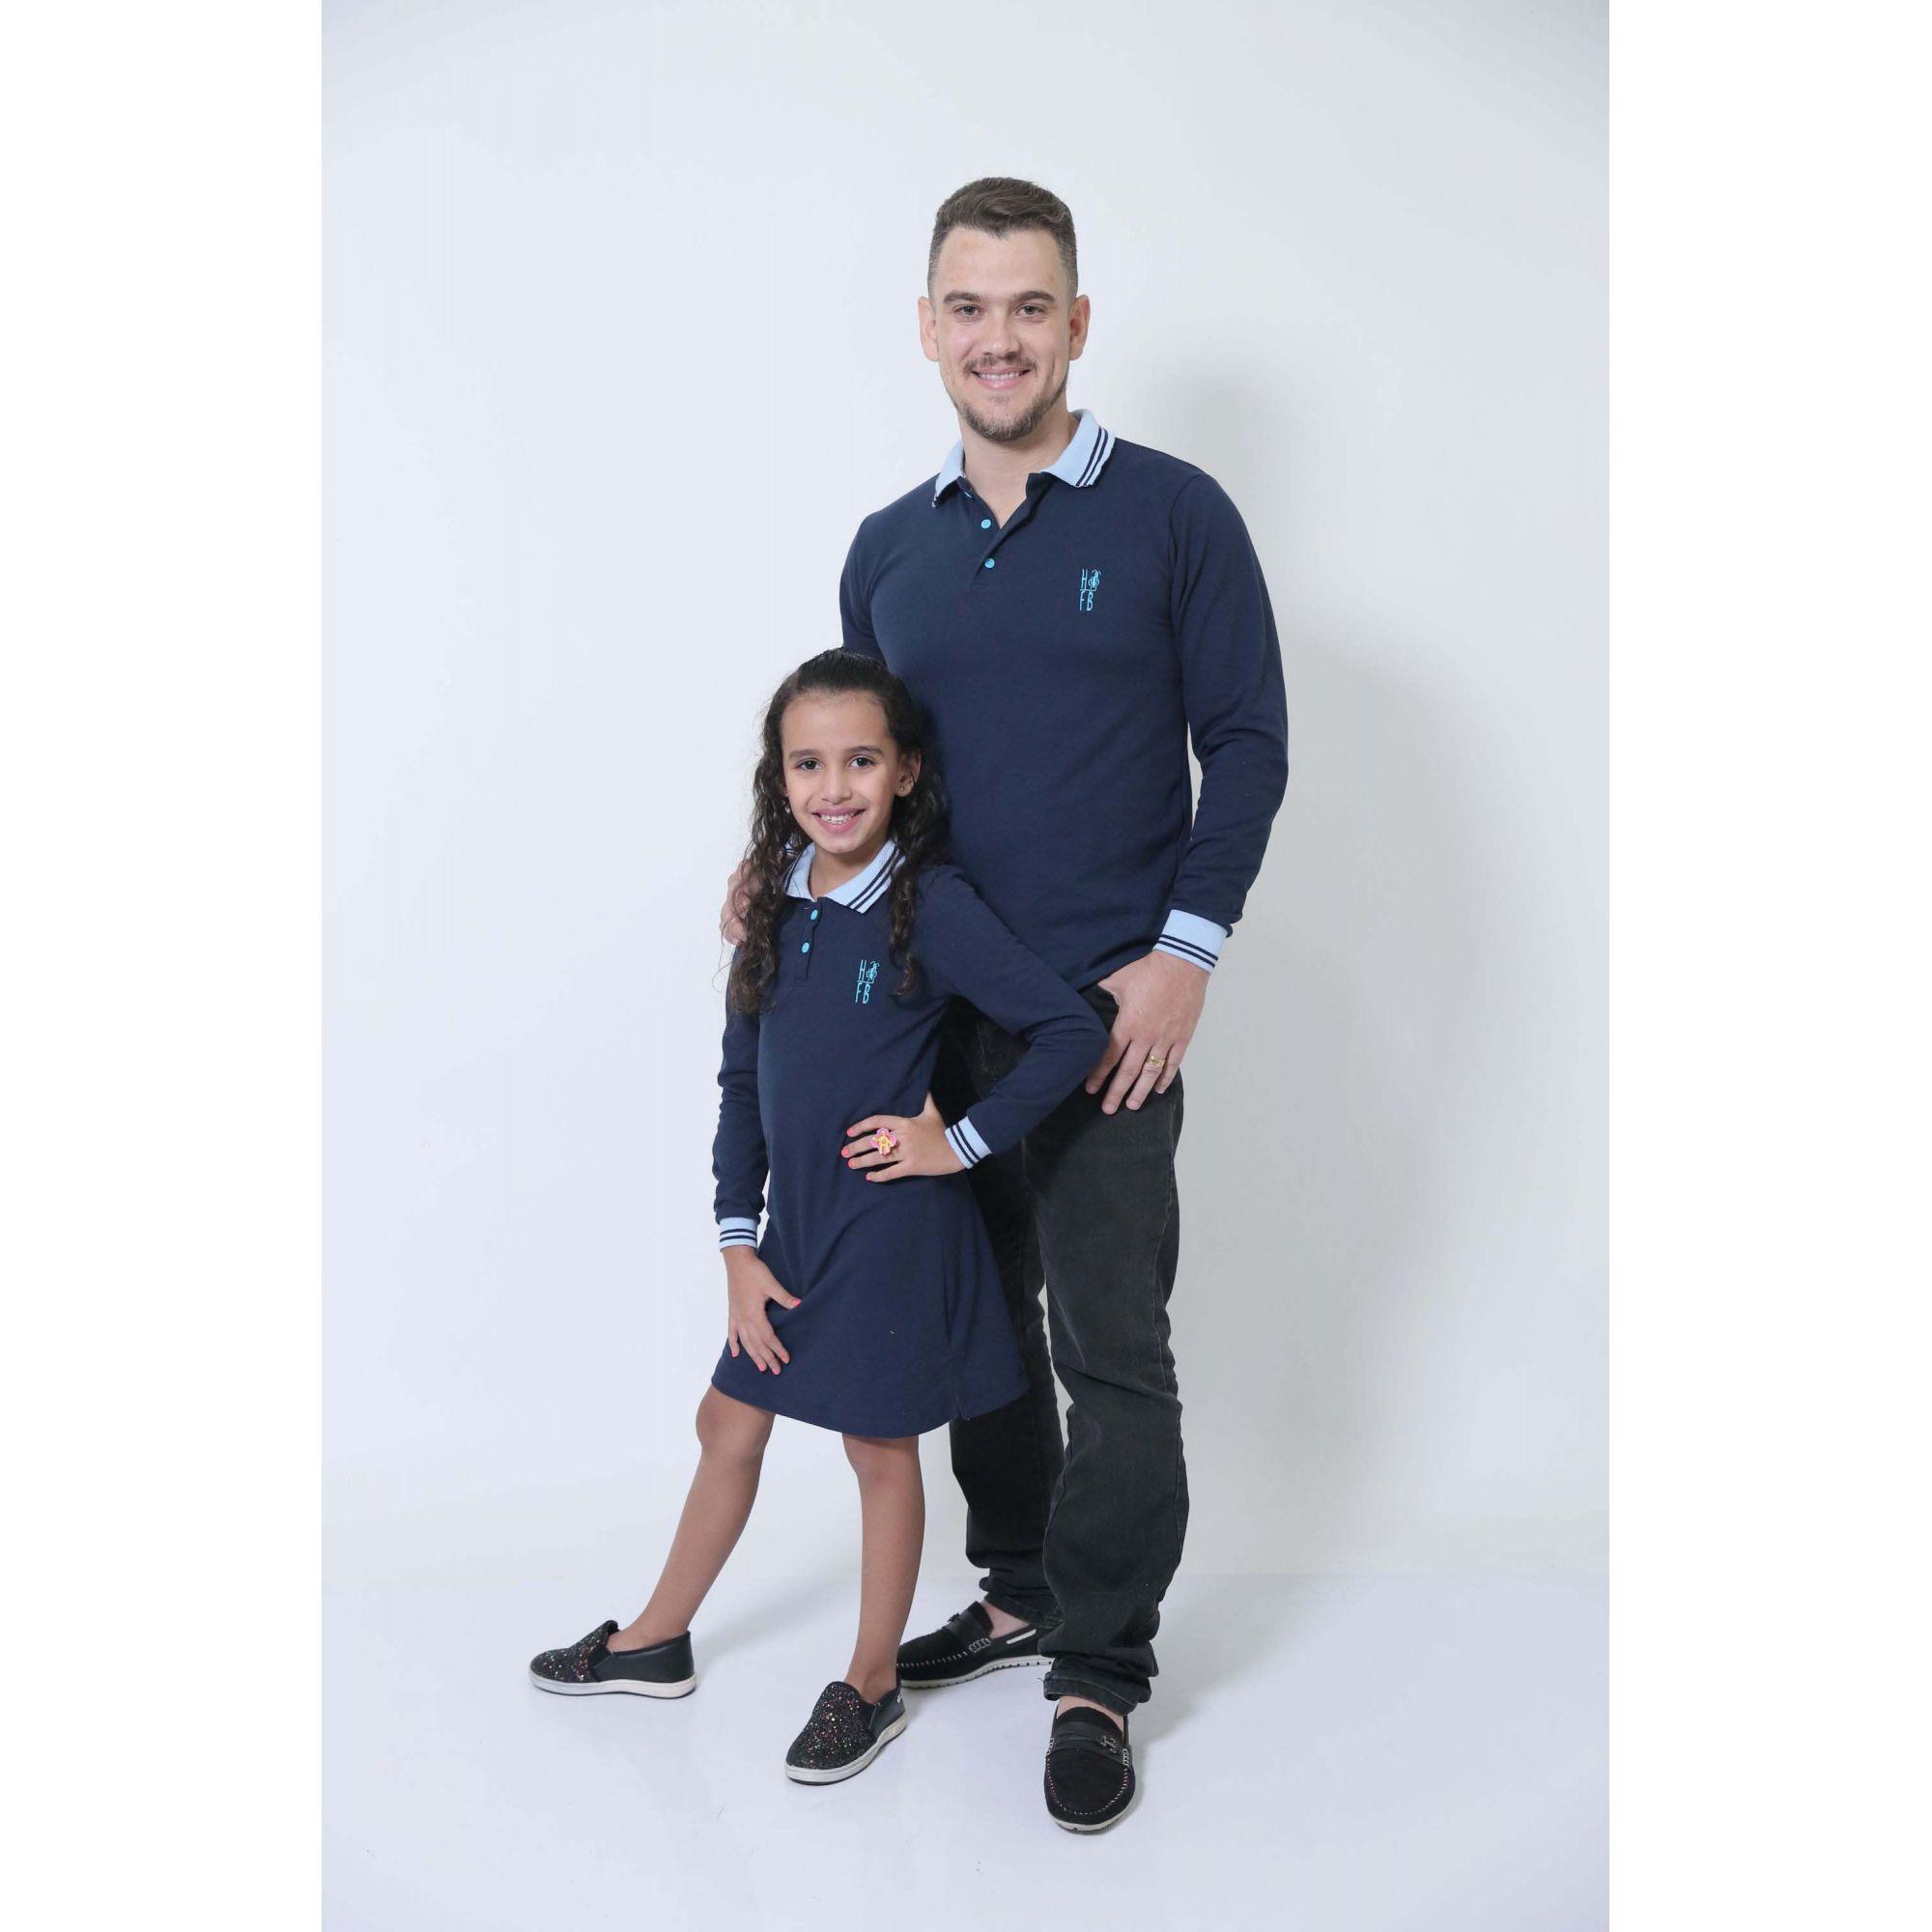 PAI E FILHA > Kit 02 Peças Camisa + Vestido Polo Infantil Azul Manga Longa [Coleção Tal Pai Tal Filho]